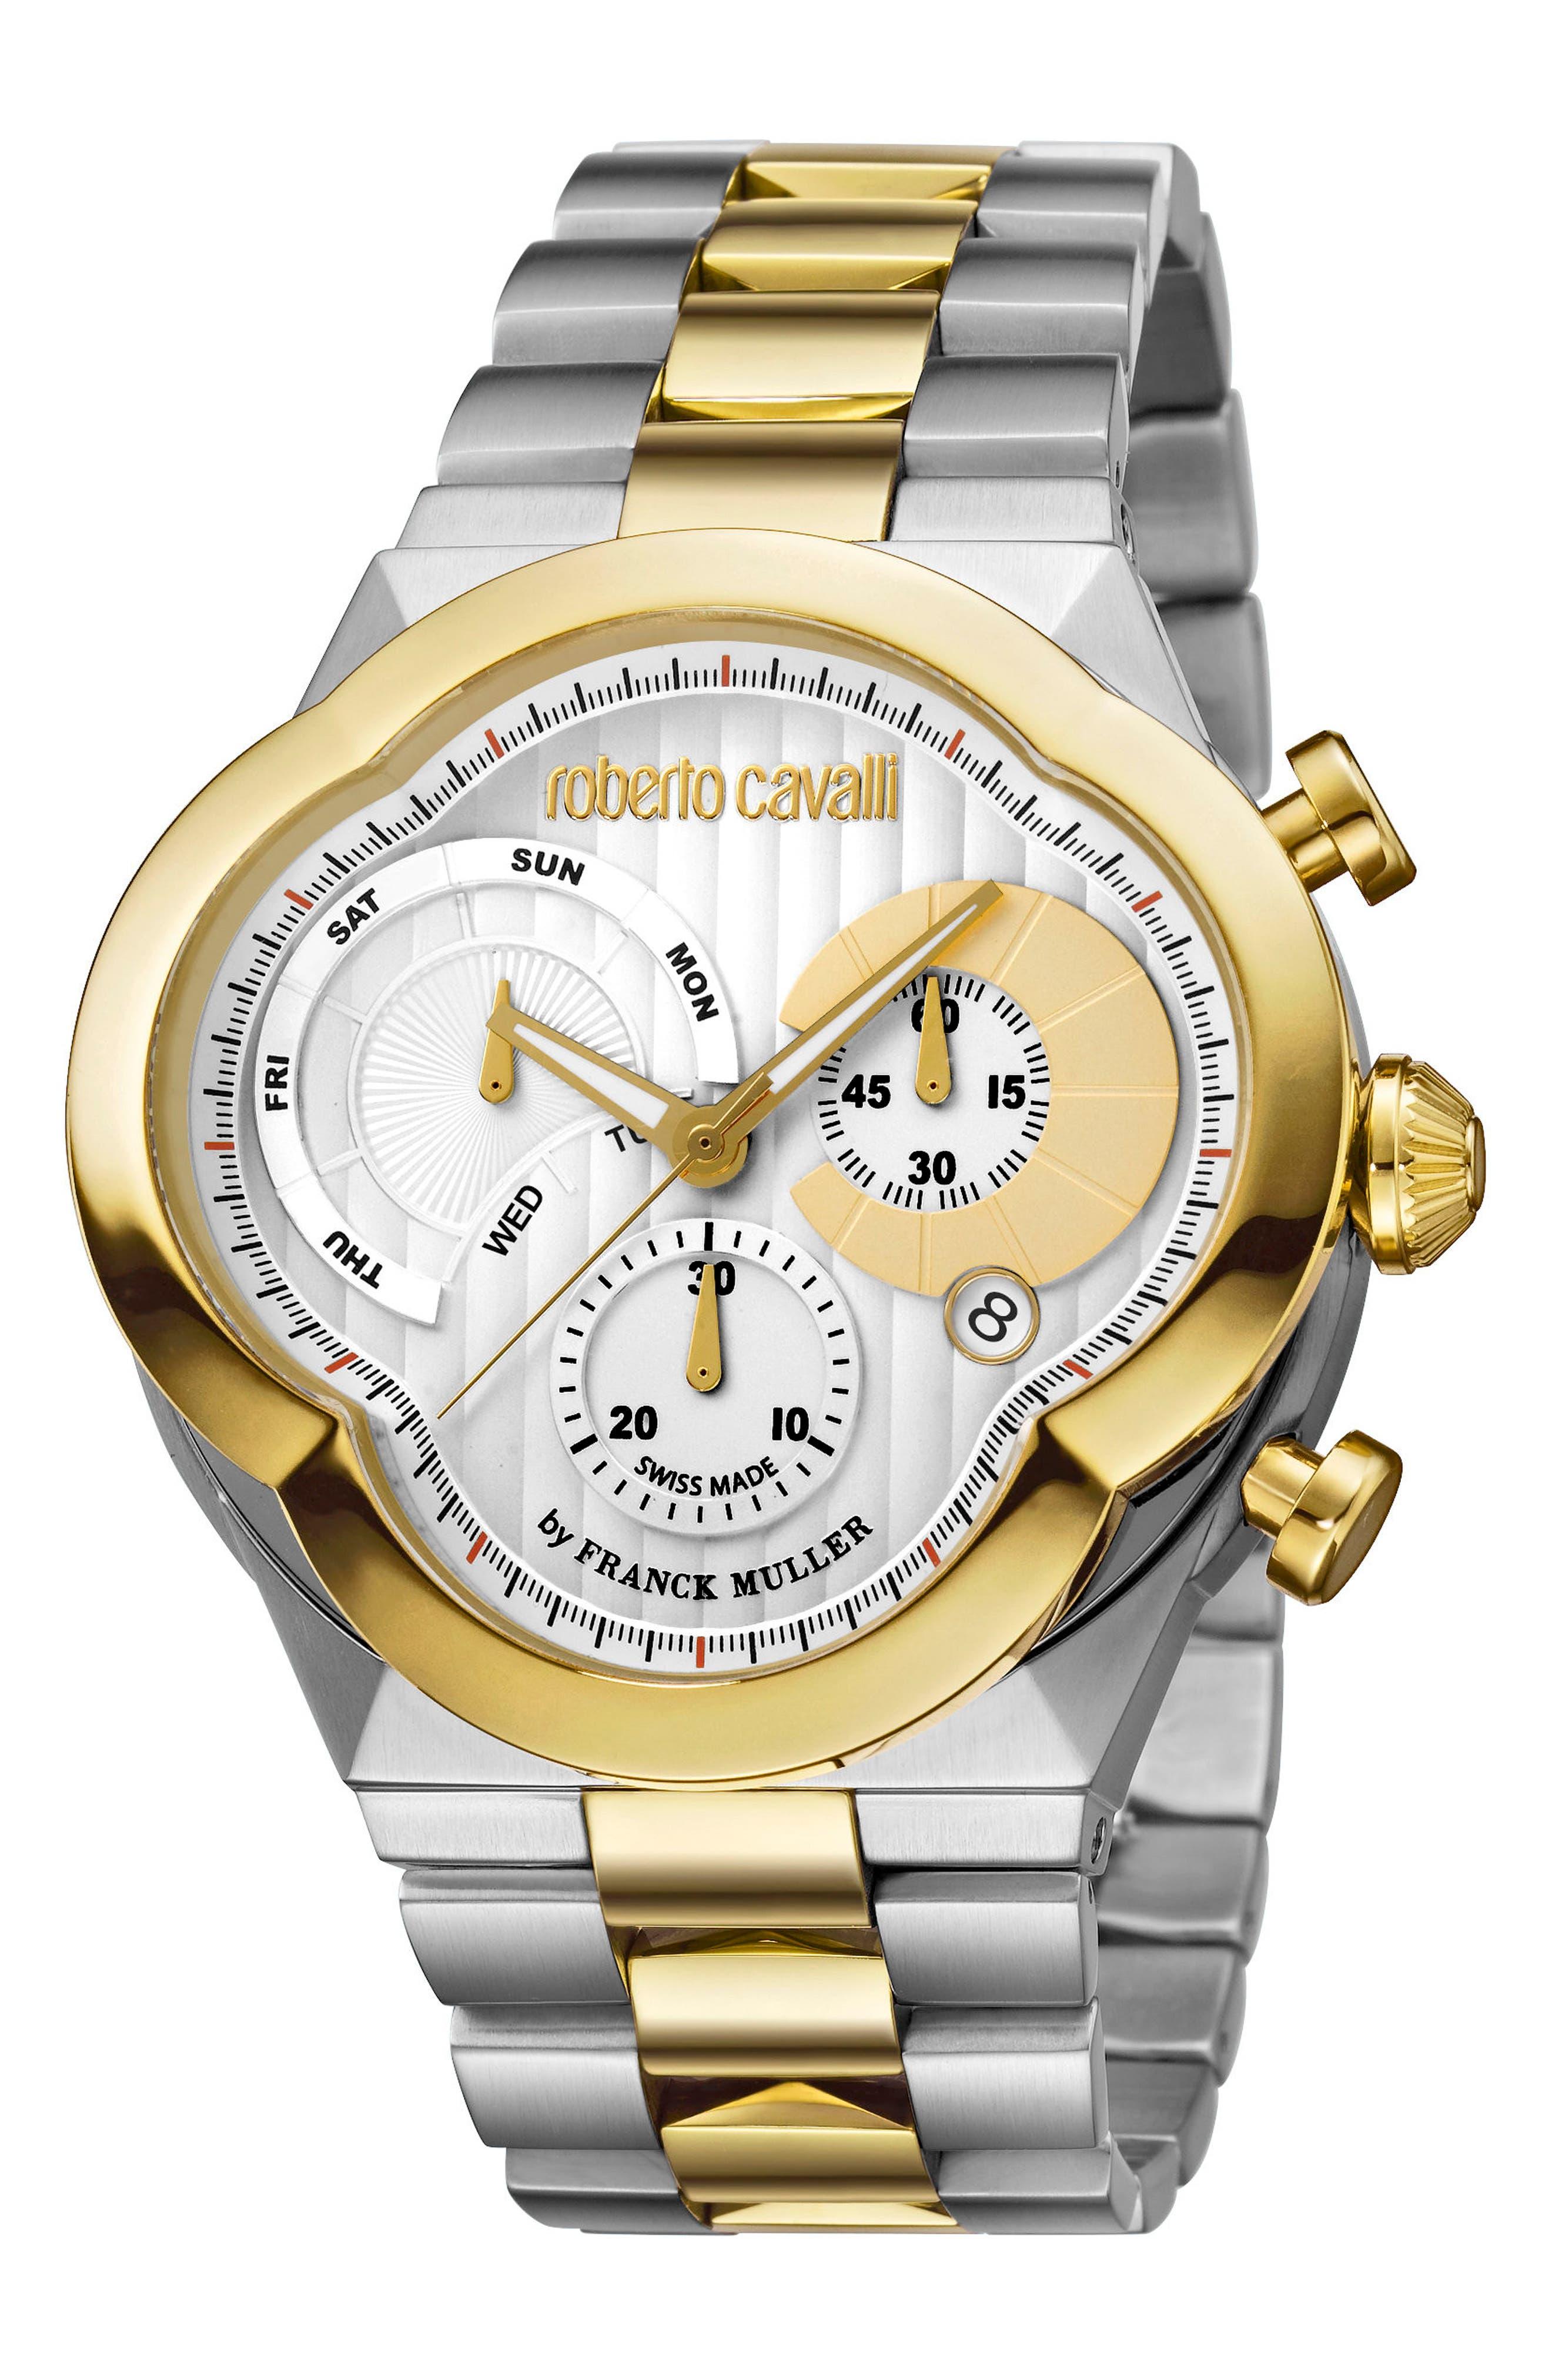 Alternate Image 1 Selected - Roberto Cavalli by Franck Muller Clover Chronograph Bracelet Watch, 47mm